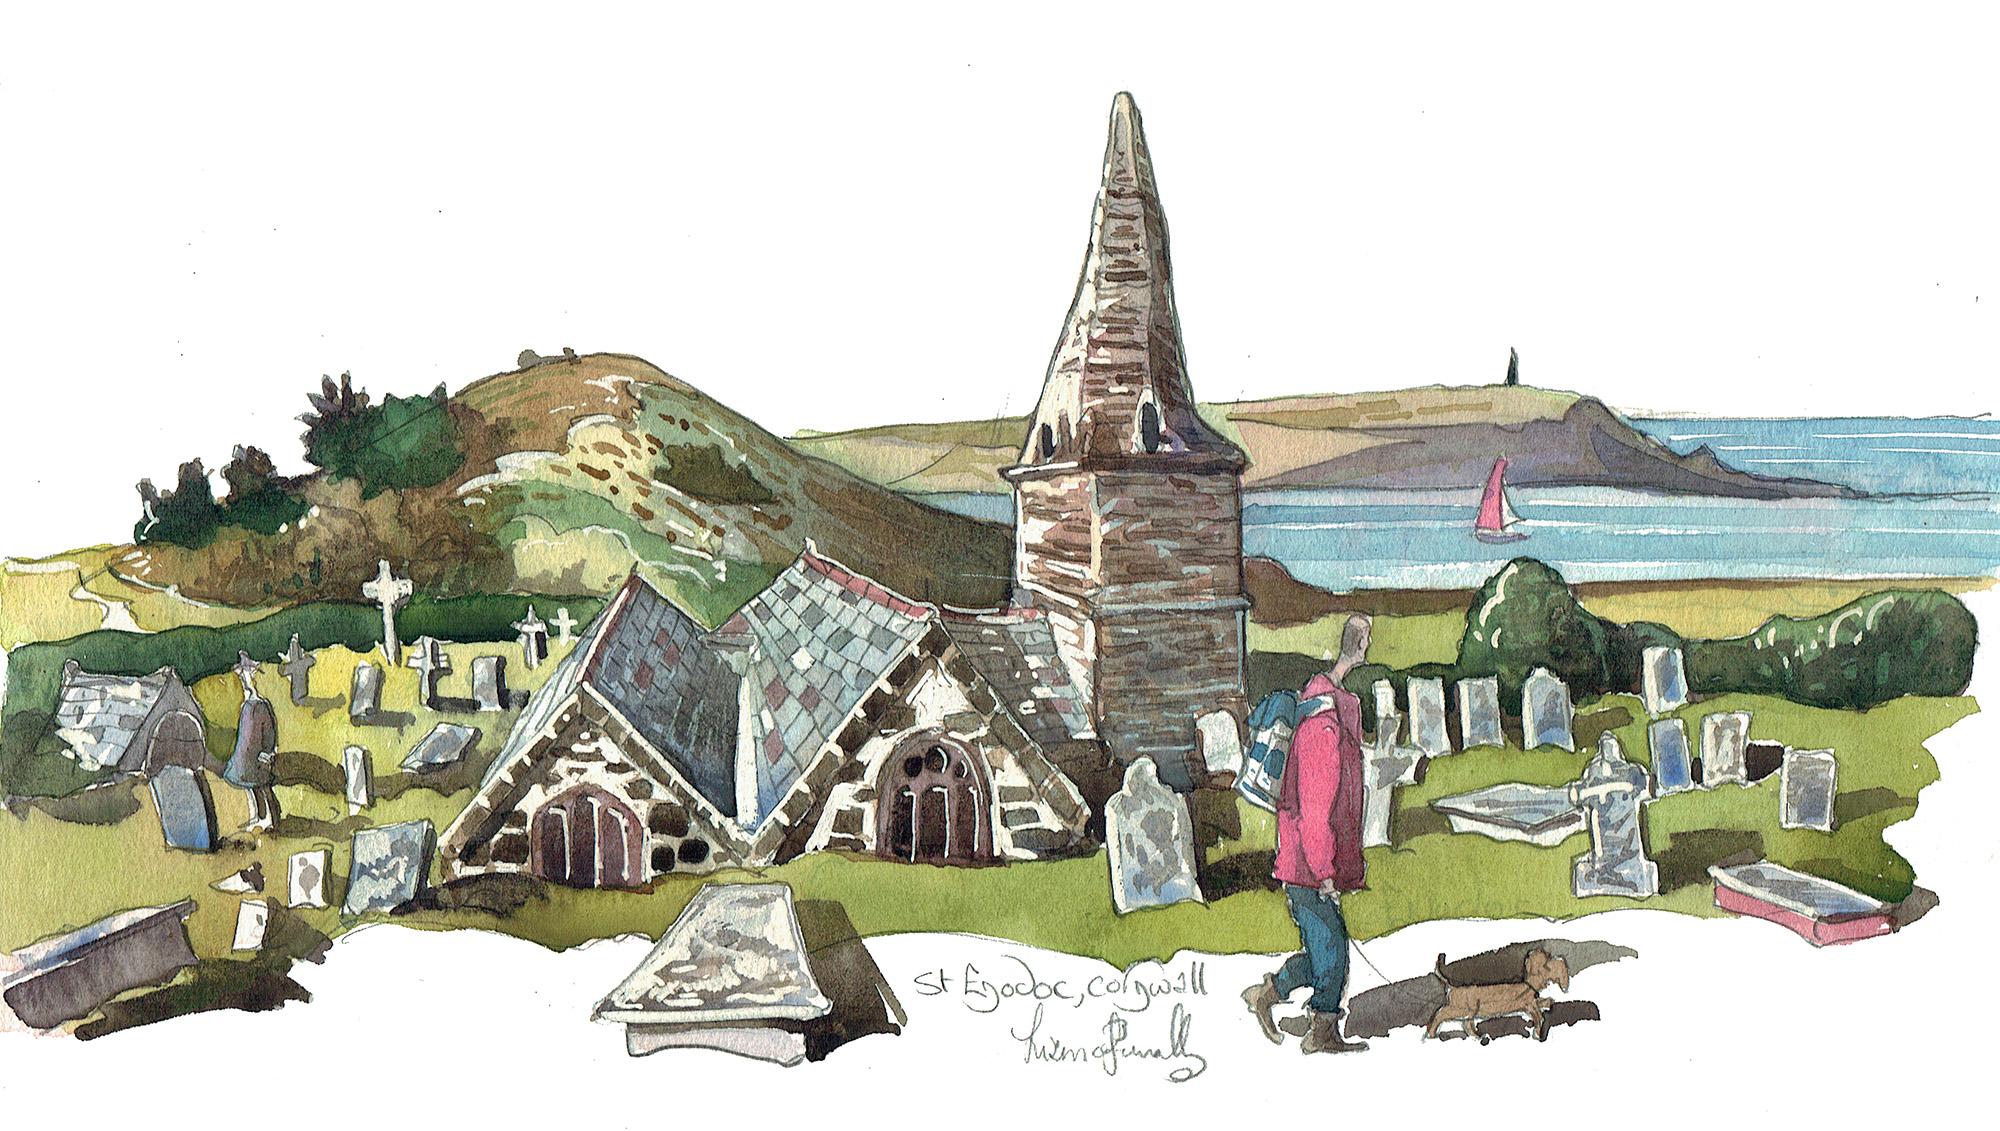 Painting of St Enodoc church Cornwall